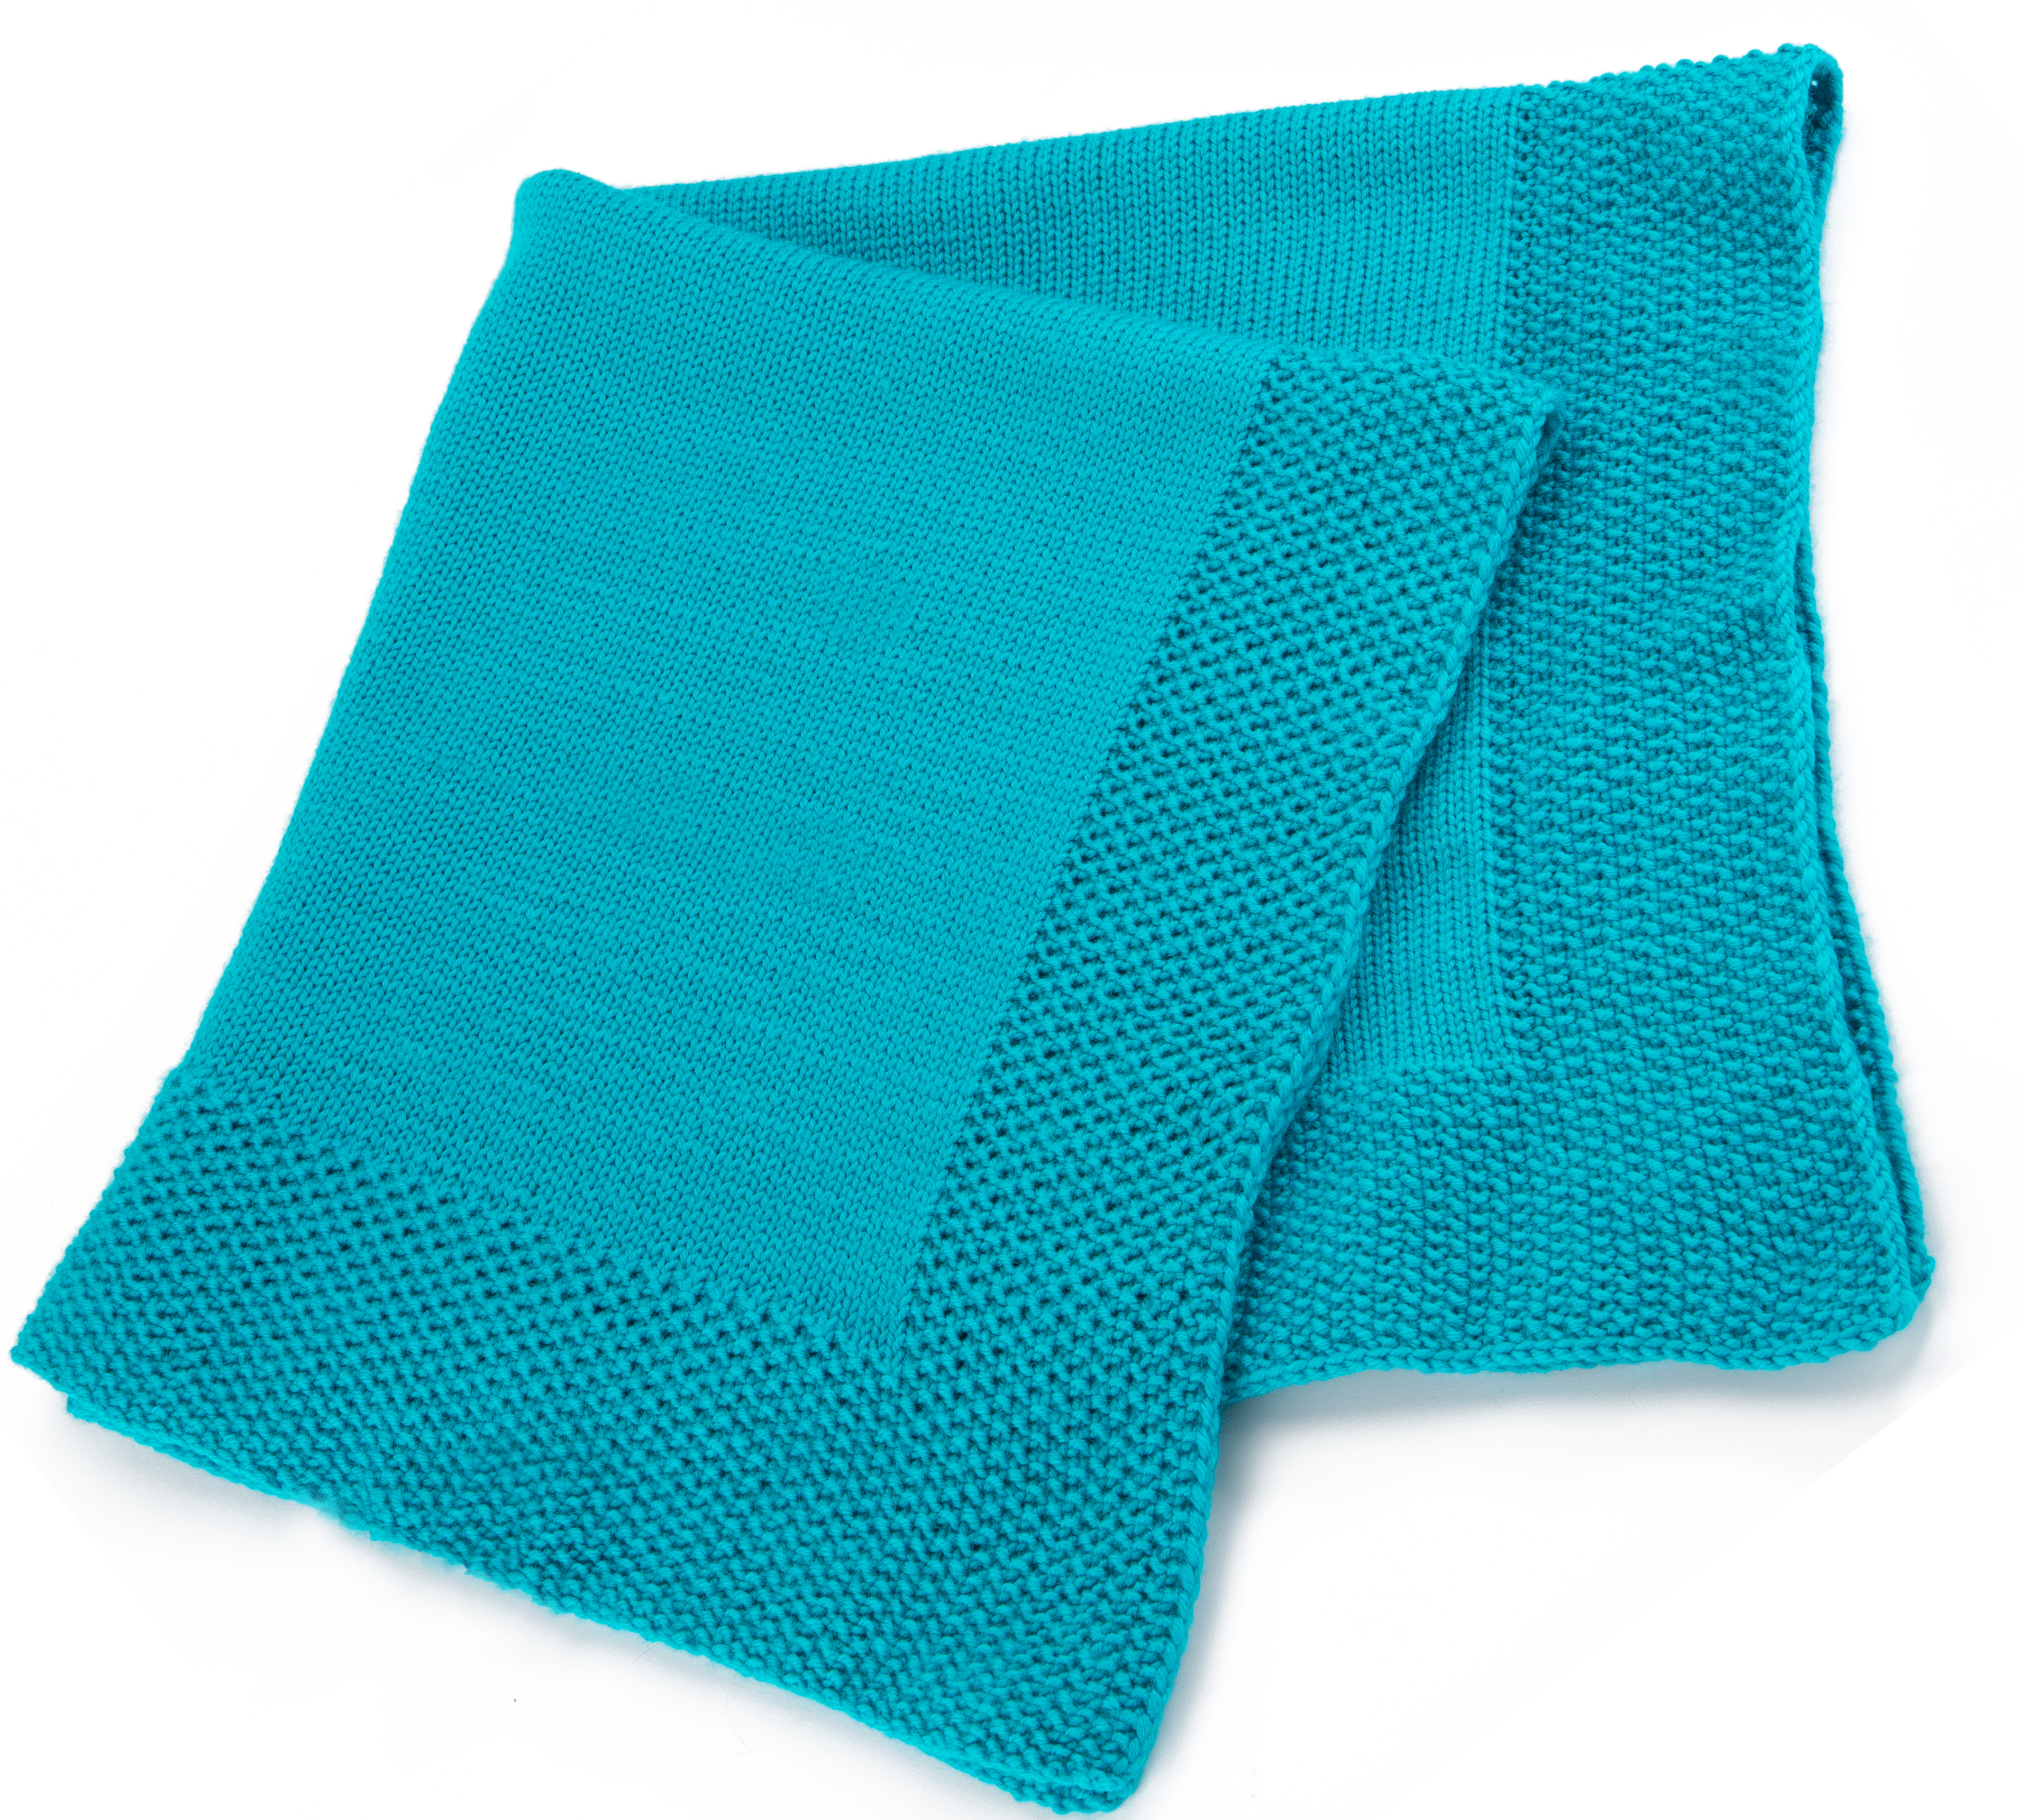 blanket-flat.jpg